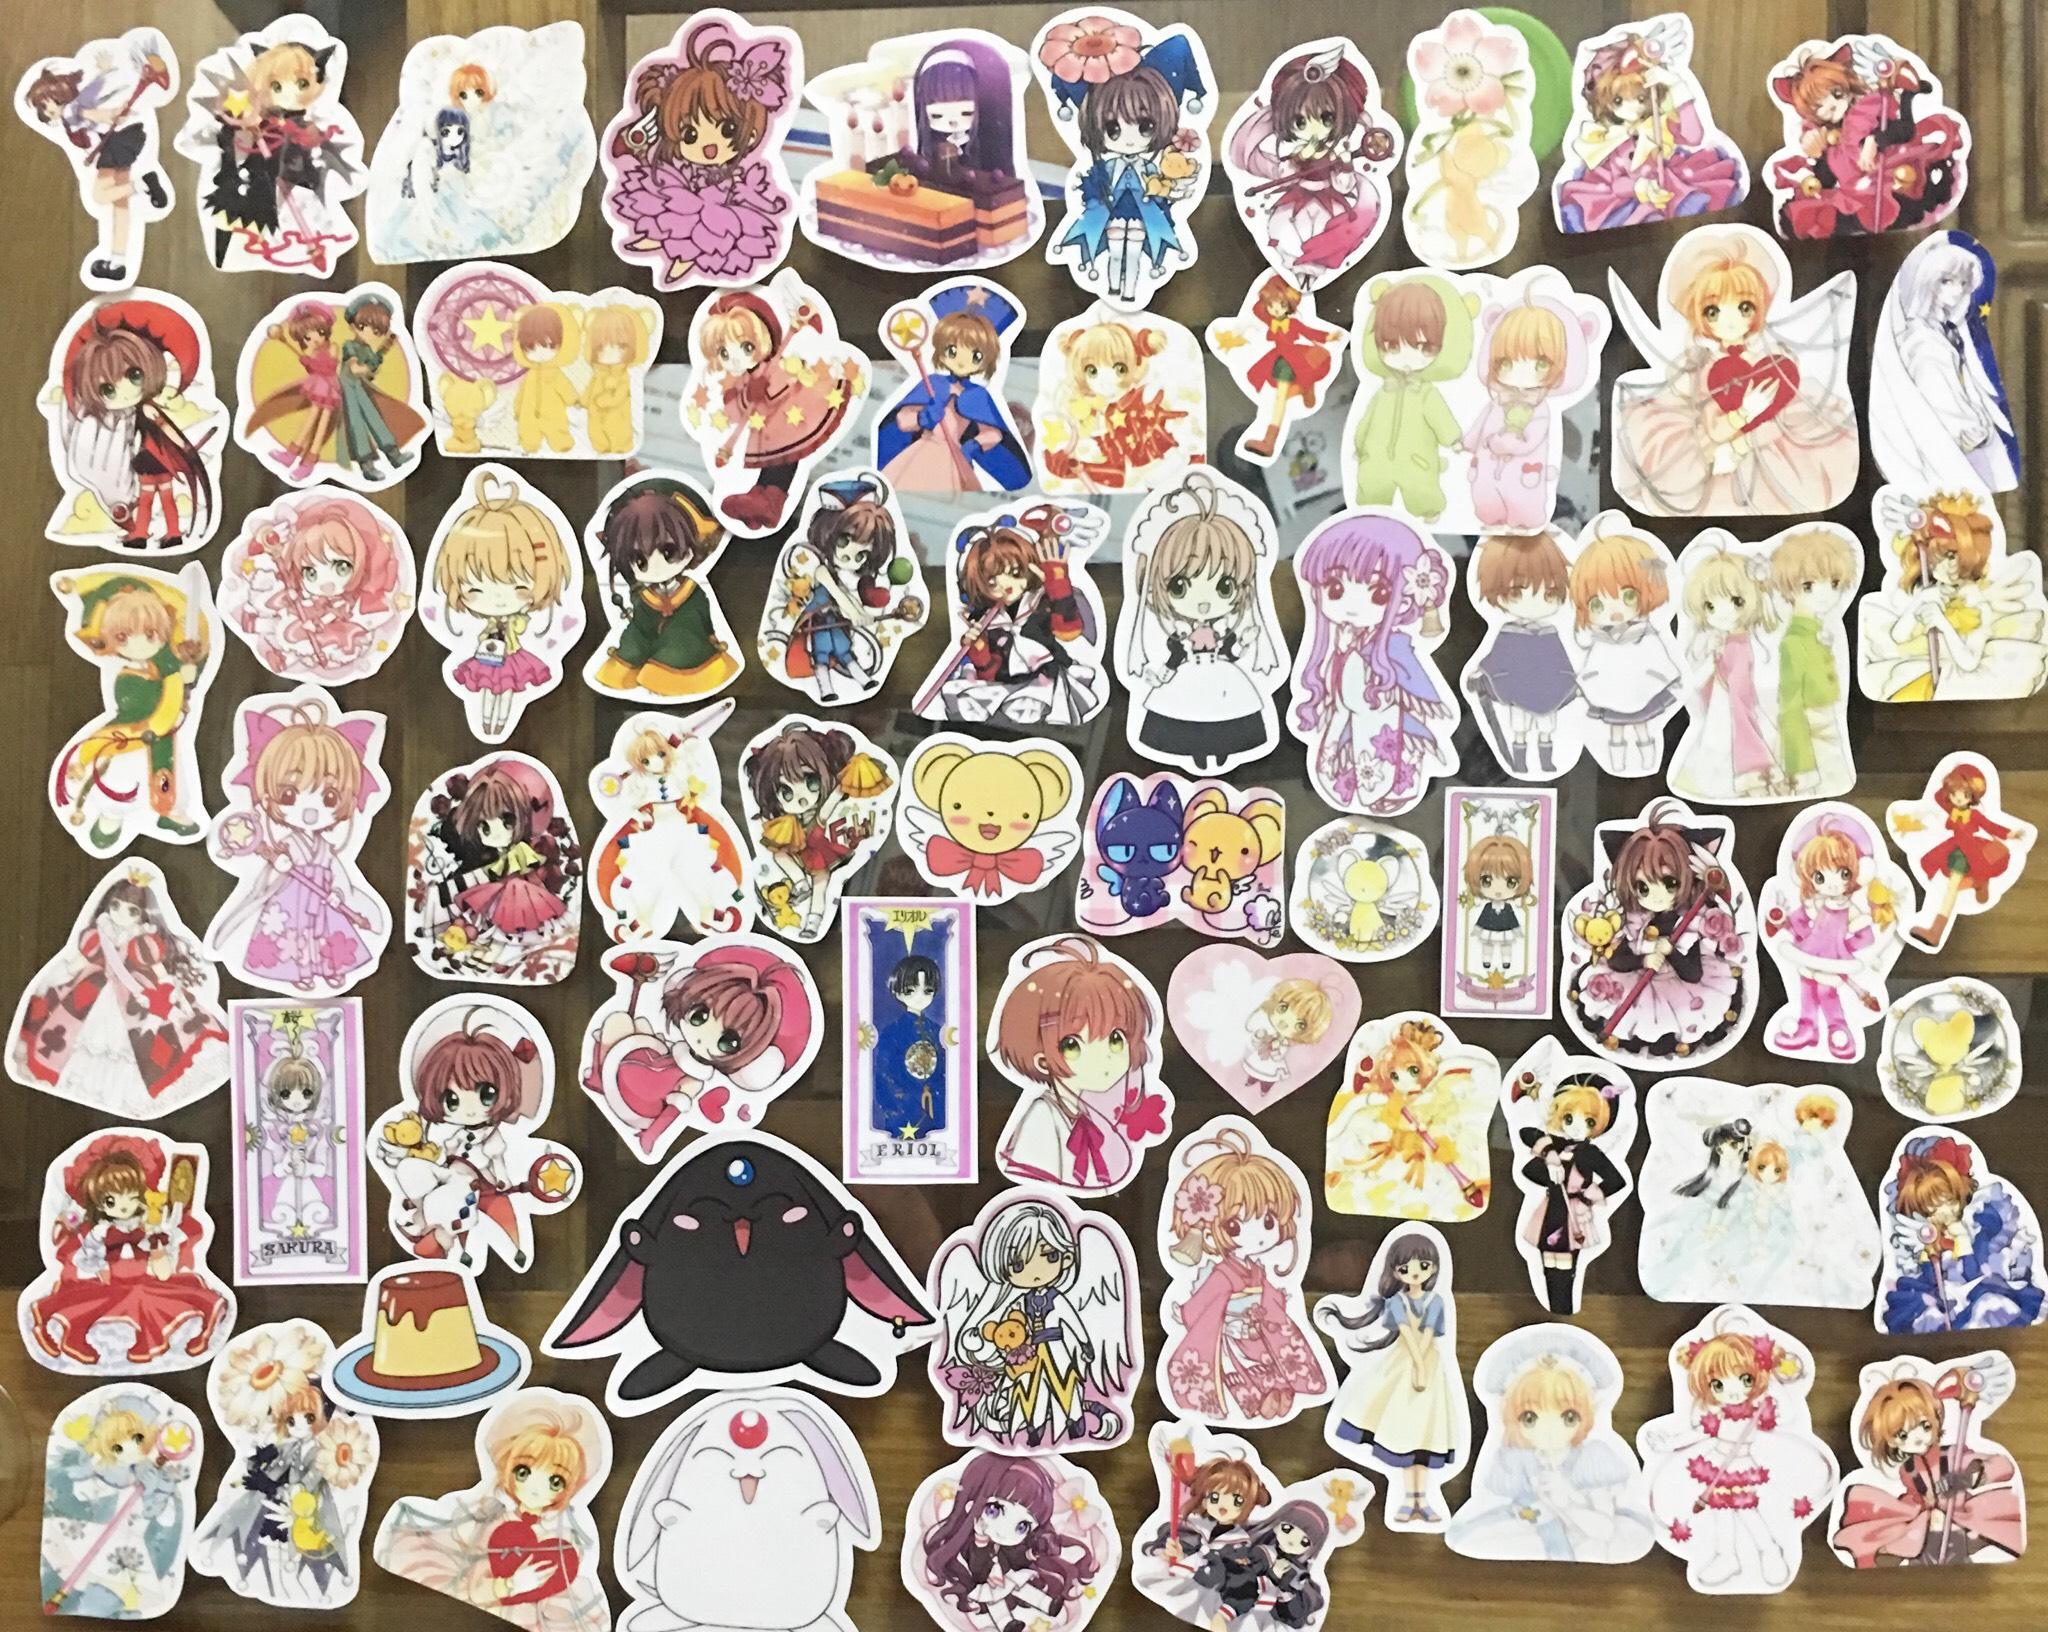 Ảnh sticker SAKURA 50 ảnh nhiều mẫu khác nhau